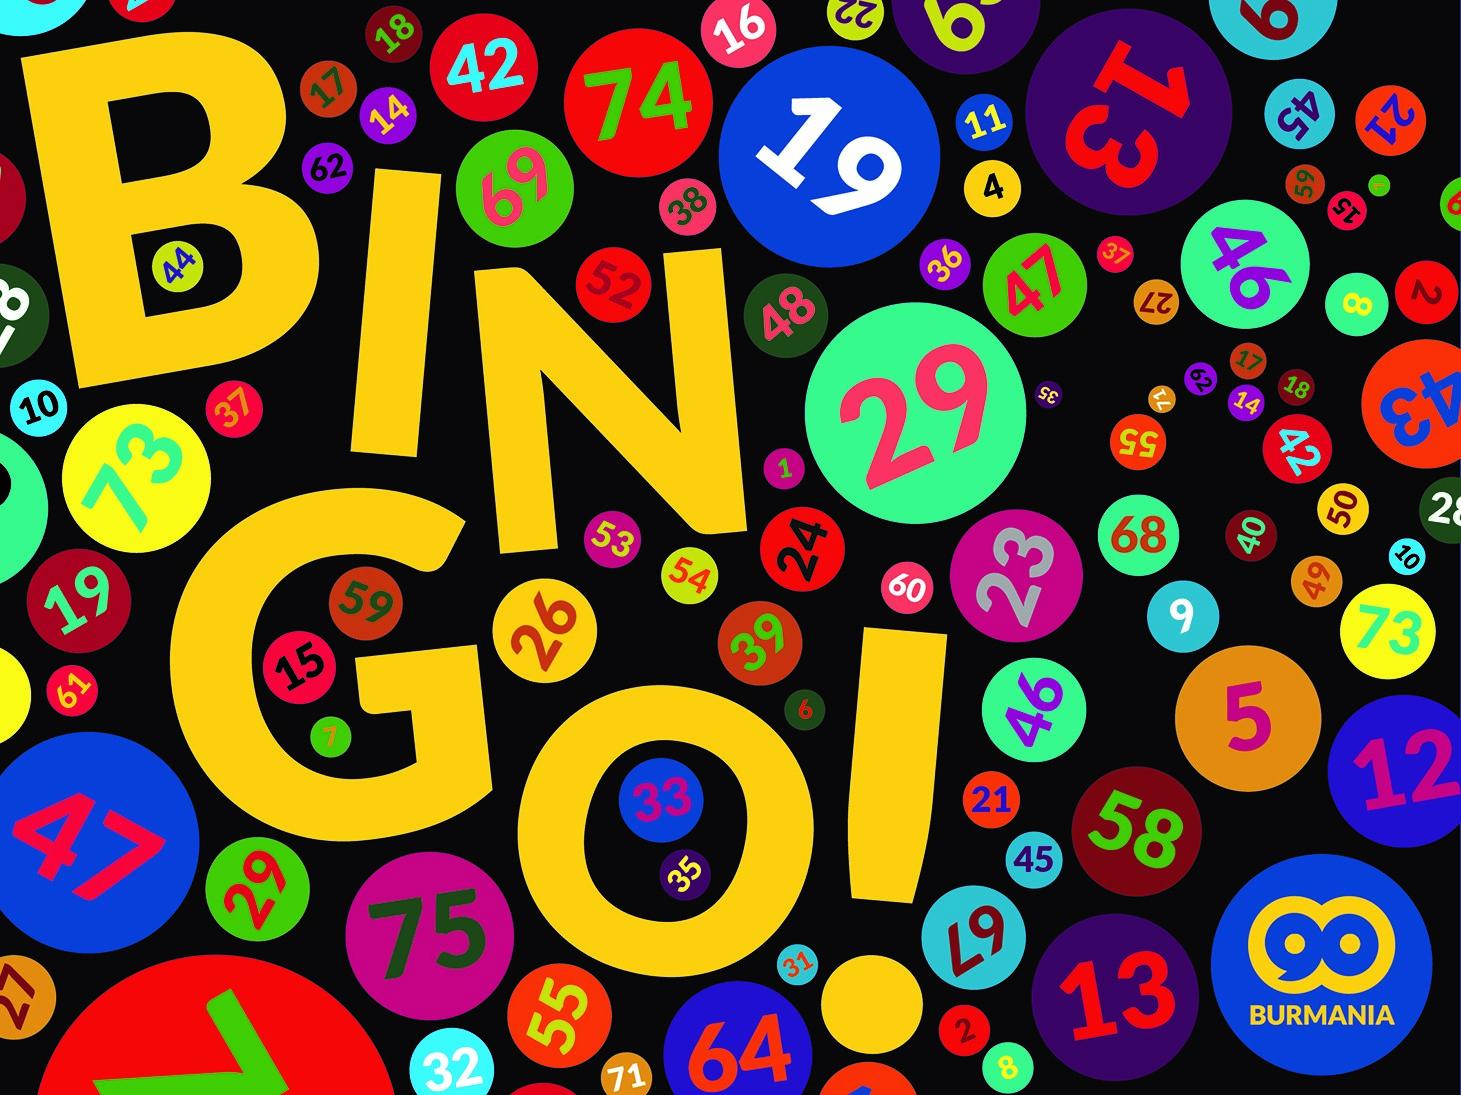 bingo burmania